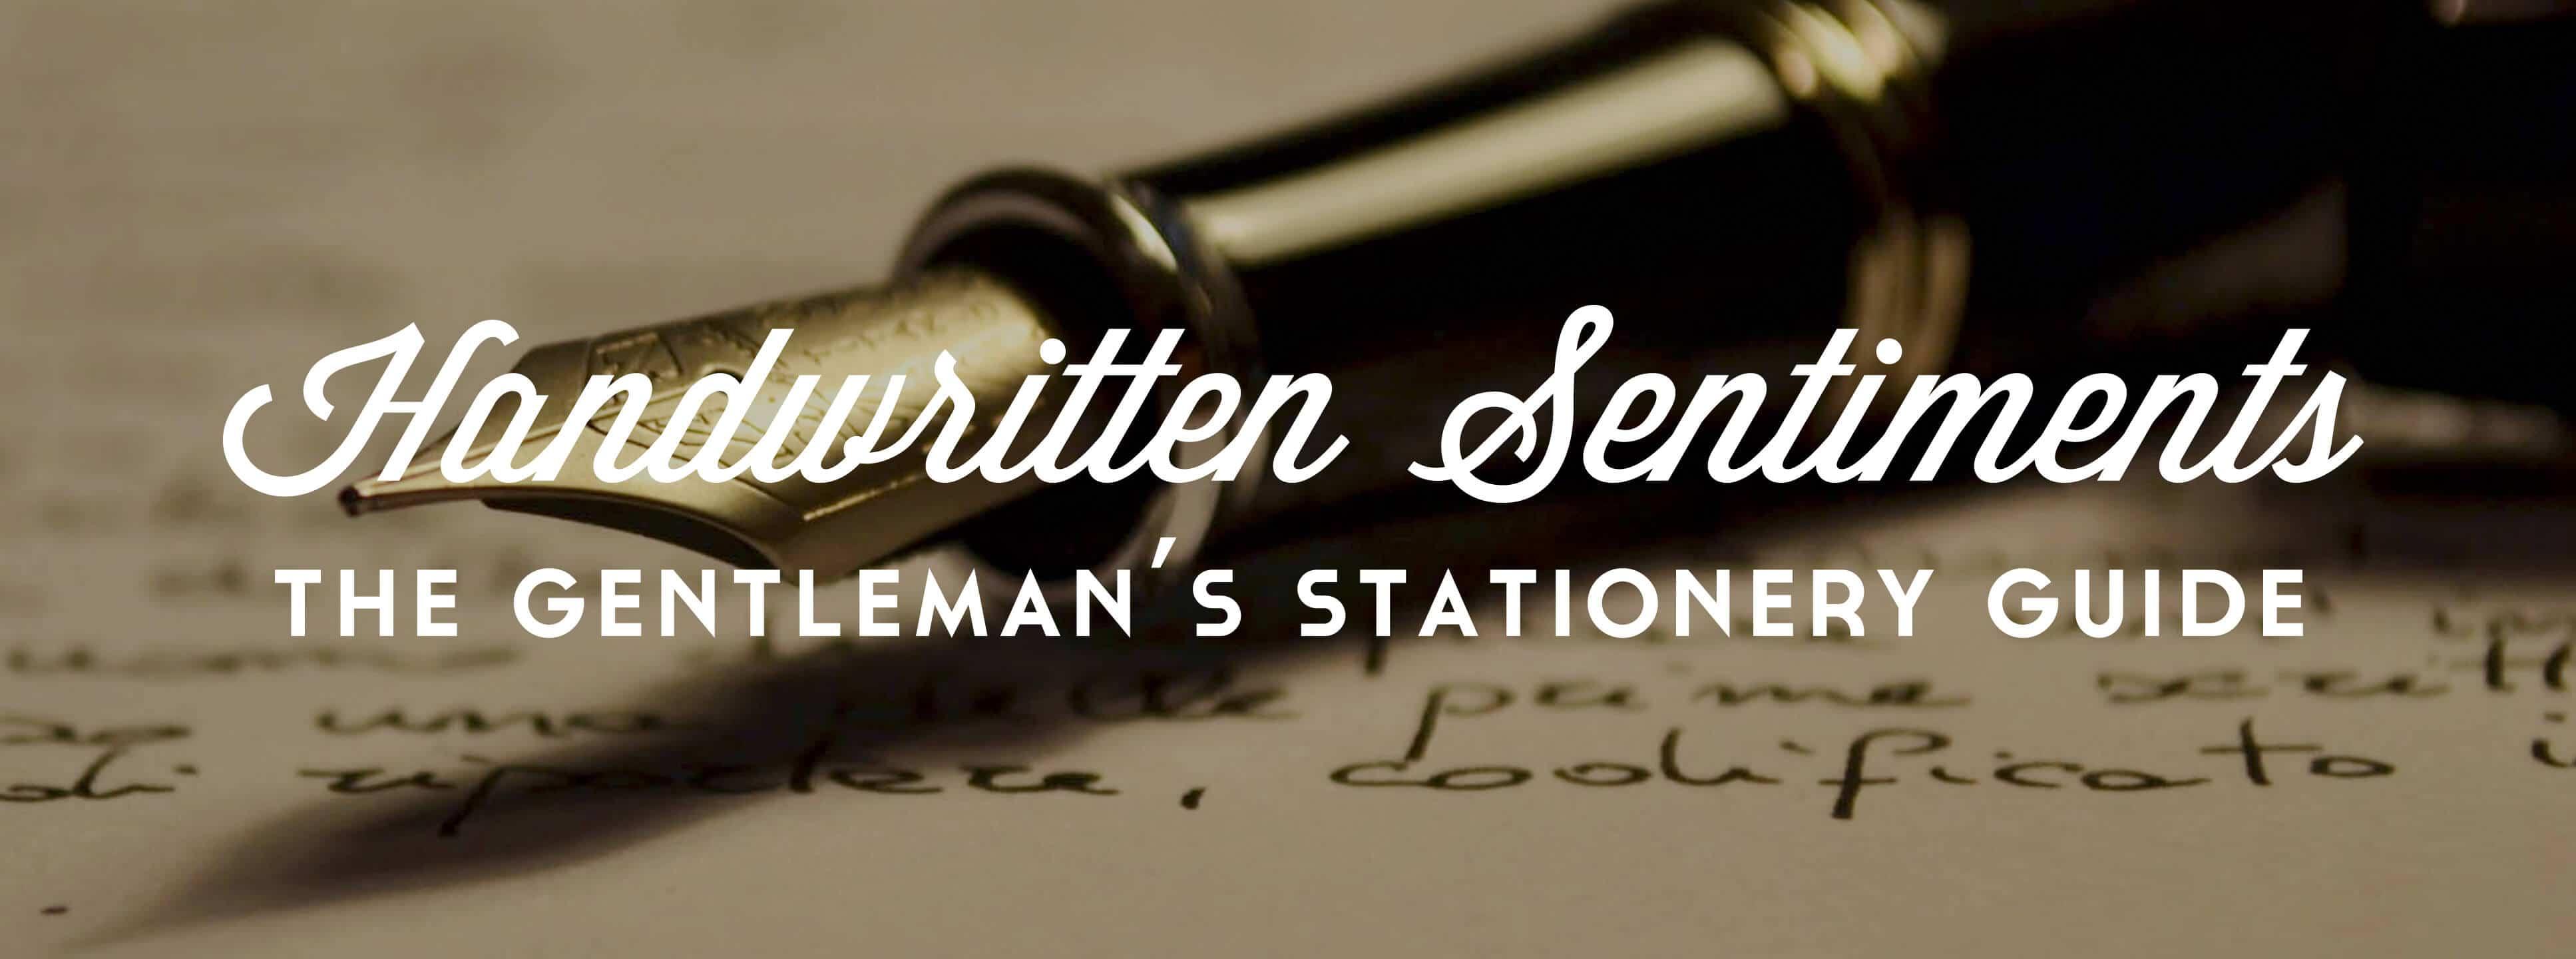 Stationery Guide - Handwritten Sentiments for Gentleman's